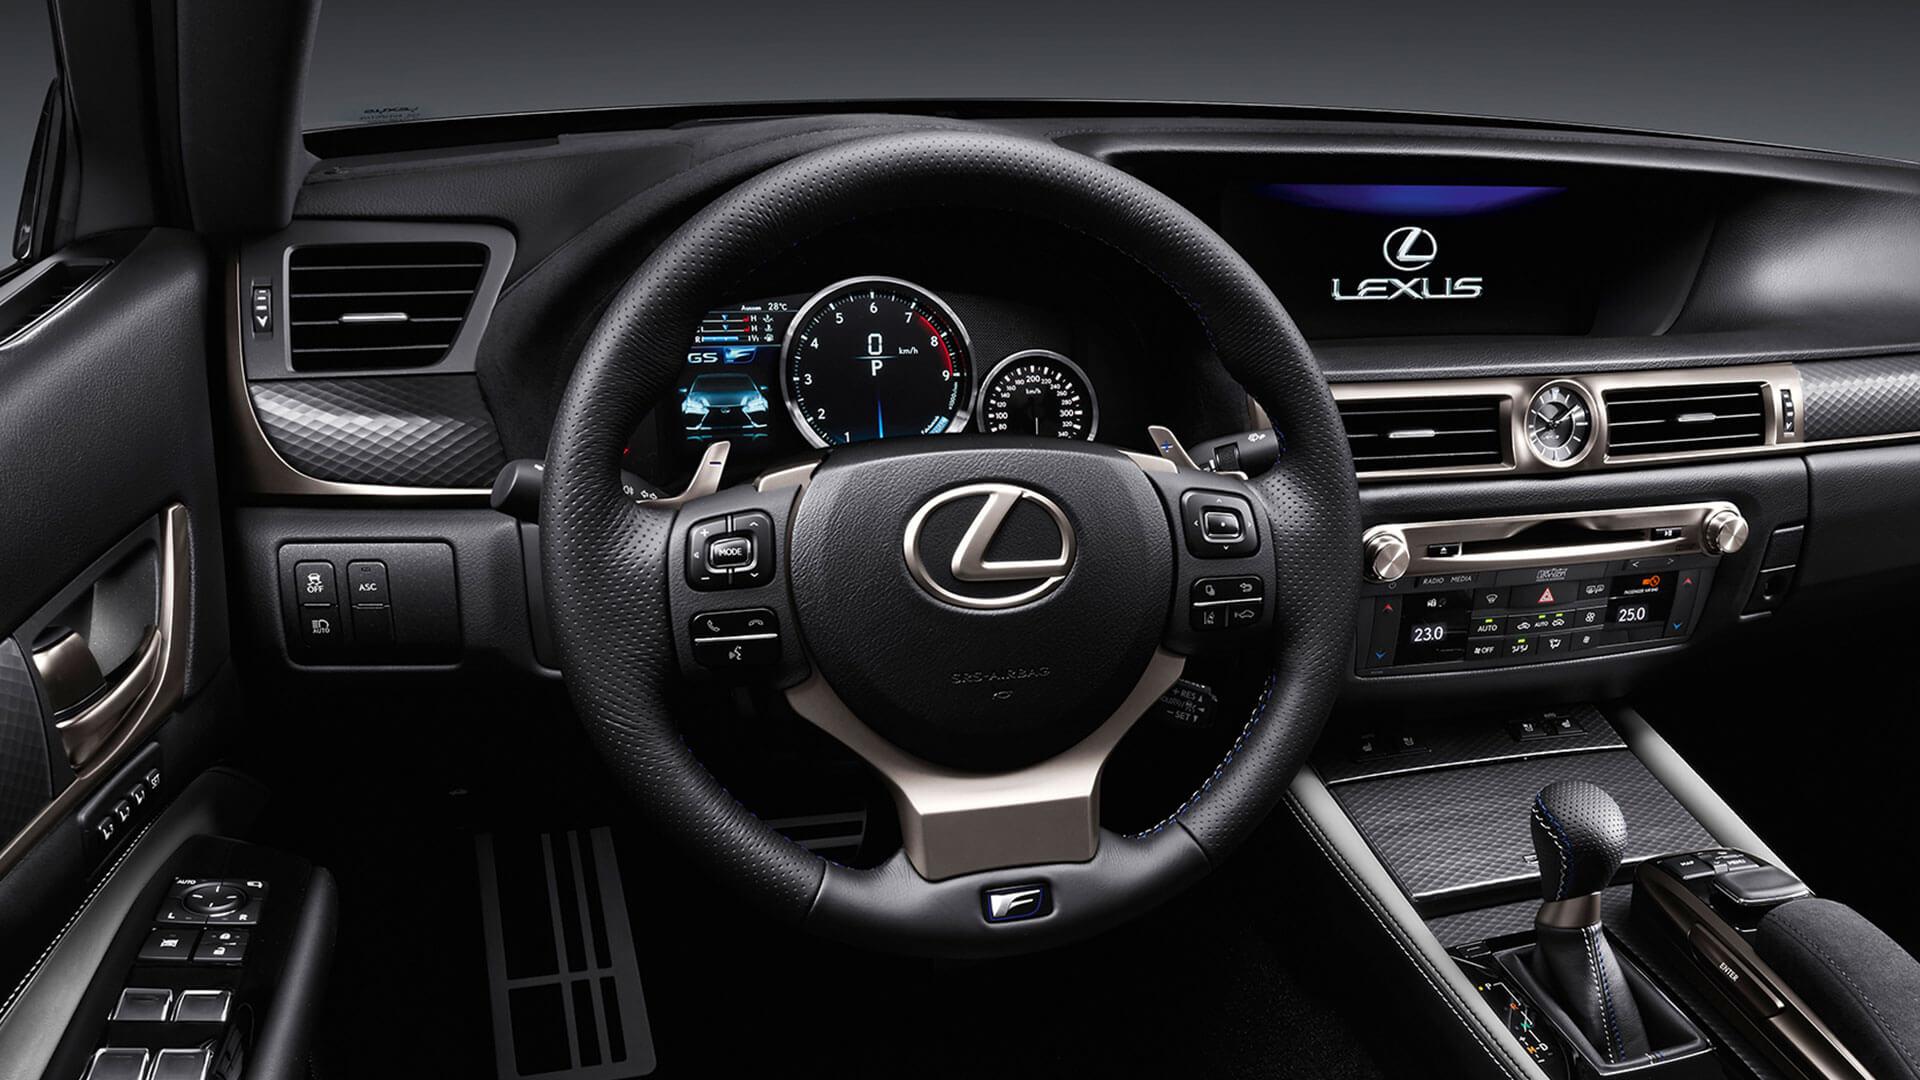 2017 lexus gs f features sports steering wheel